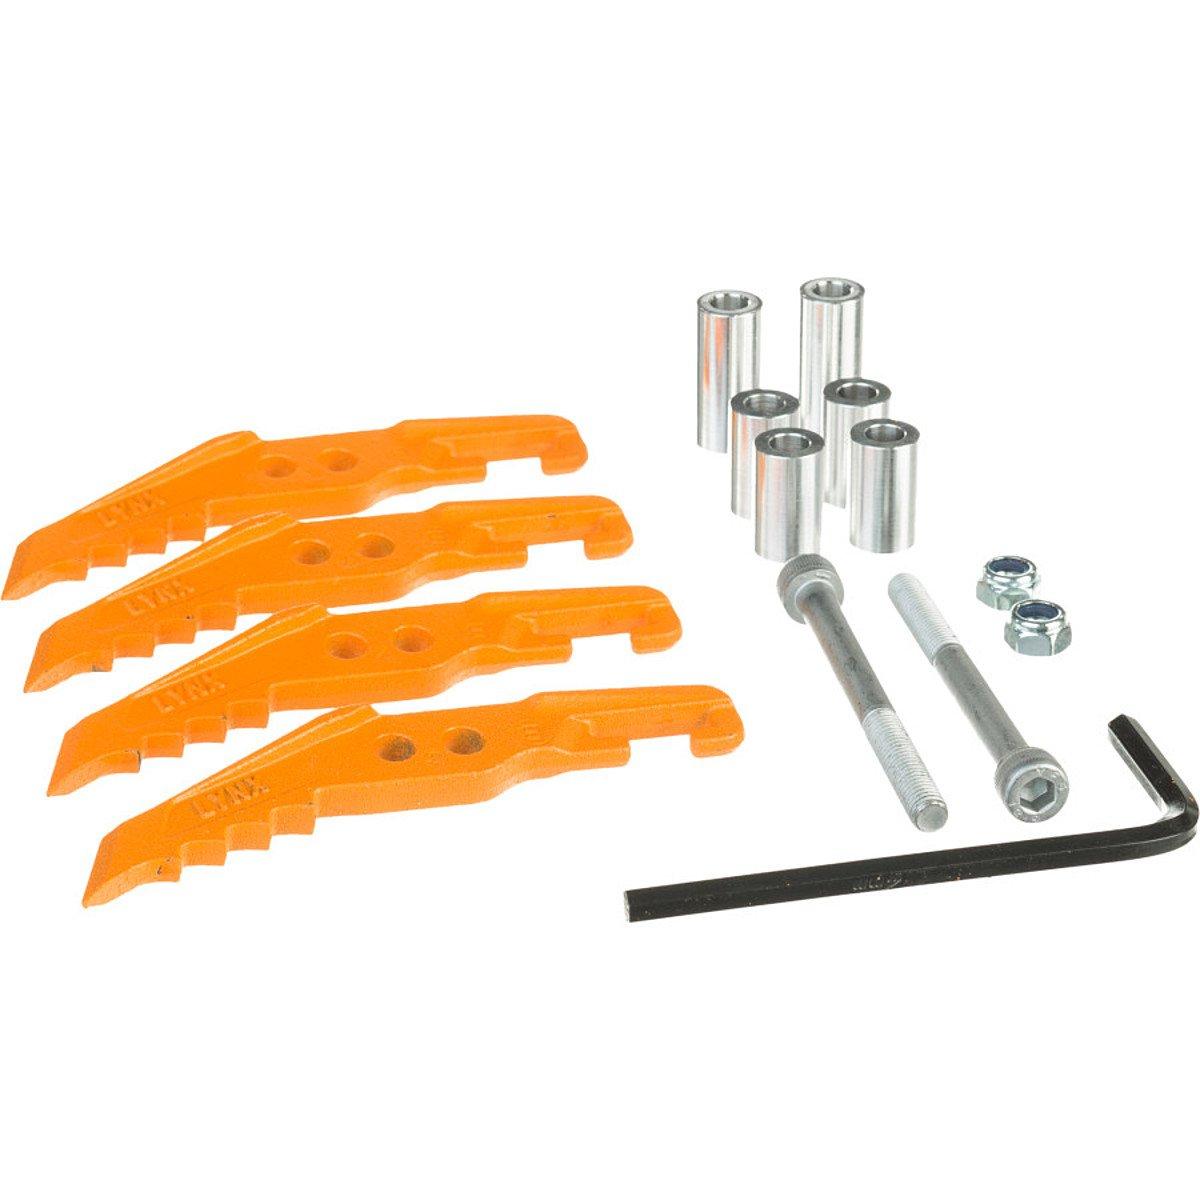 Kit Pointes Avant Lynx Petzl Color Orange